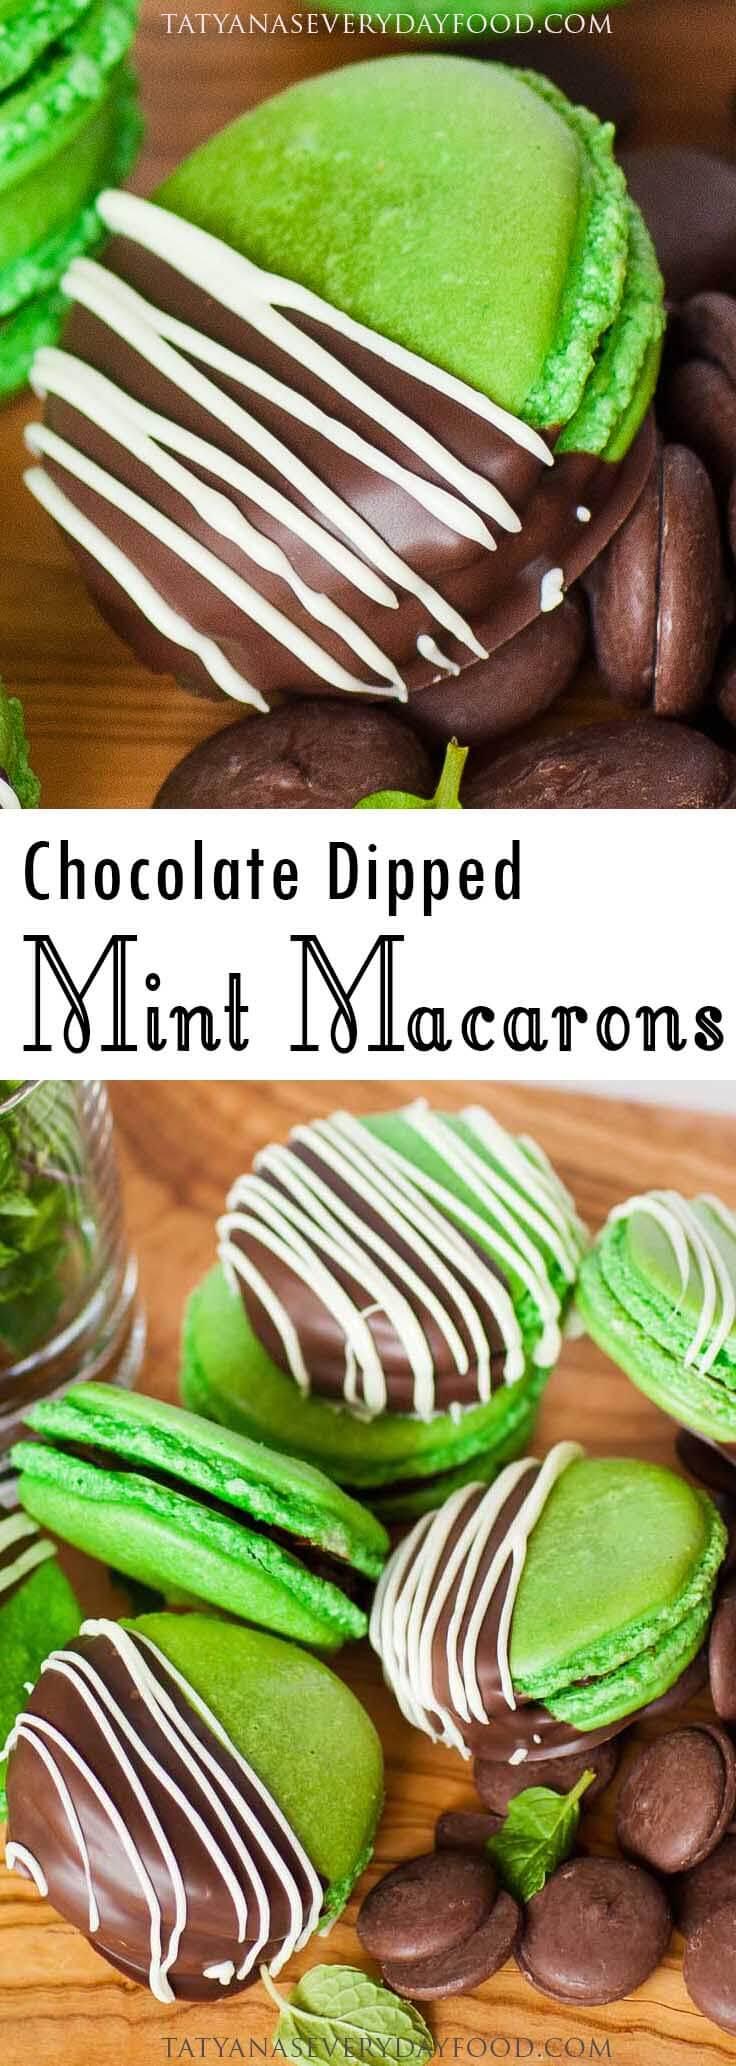 Chocolate Mint Macarons video recipe